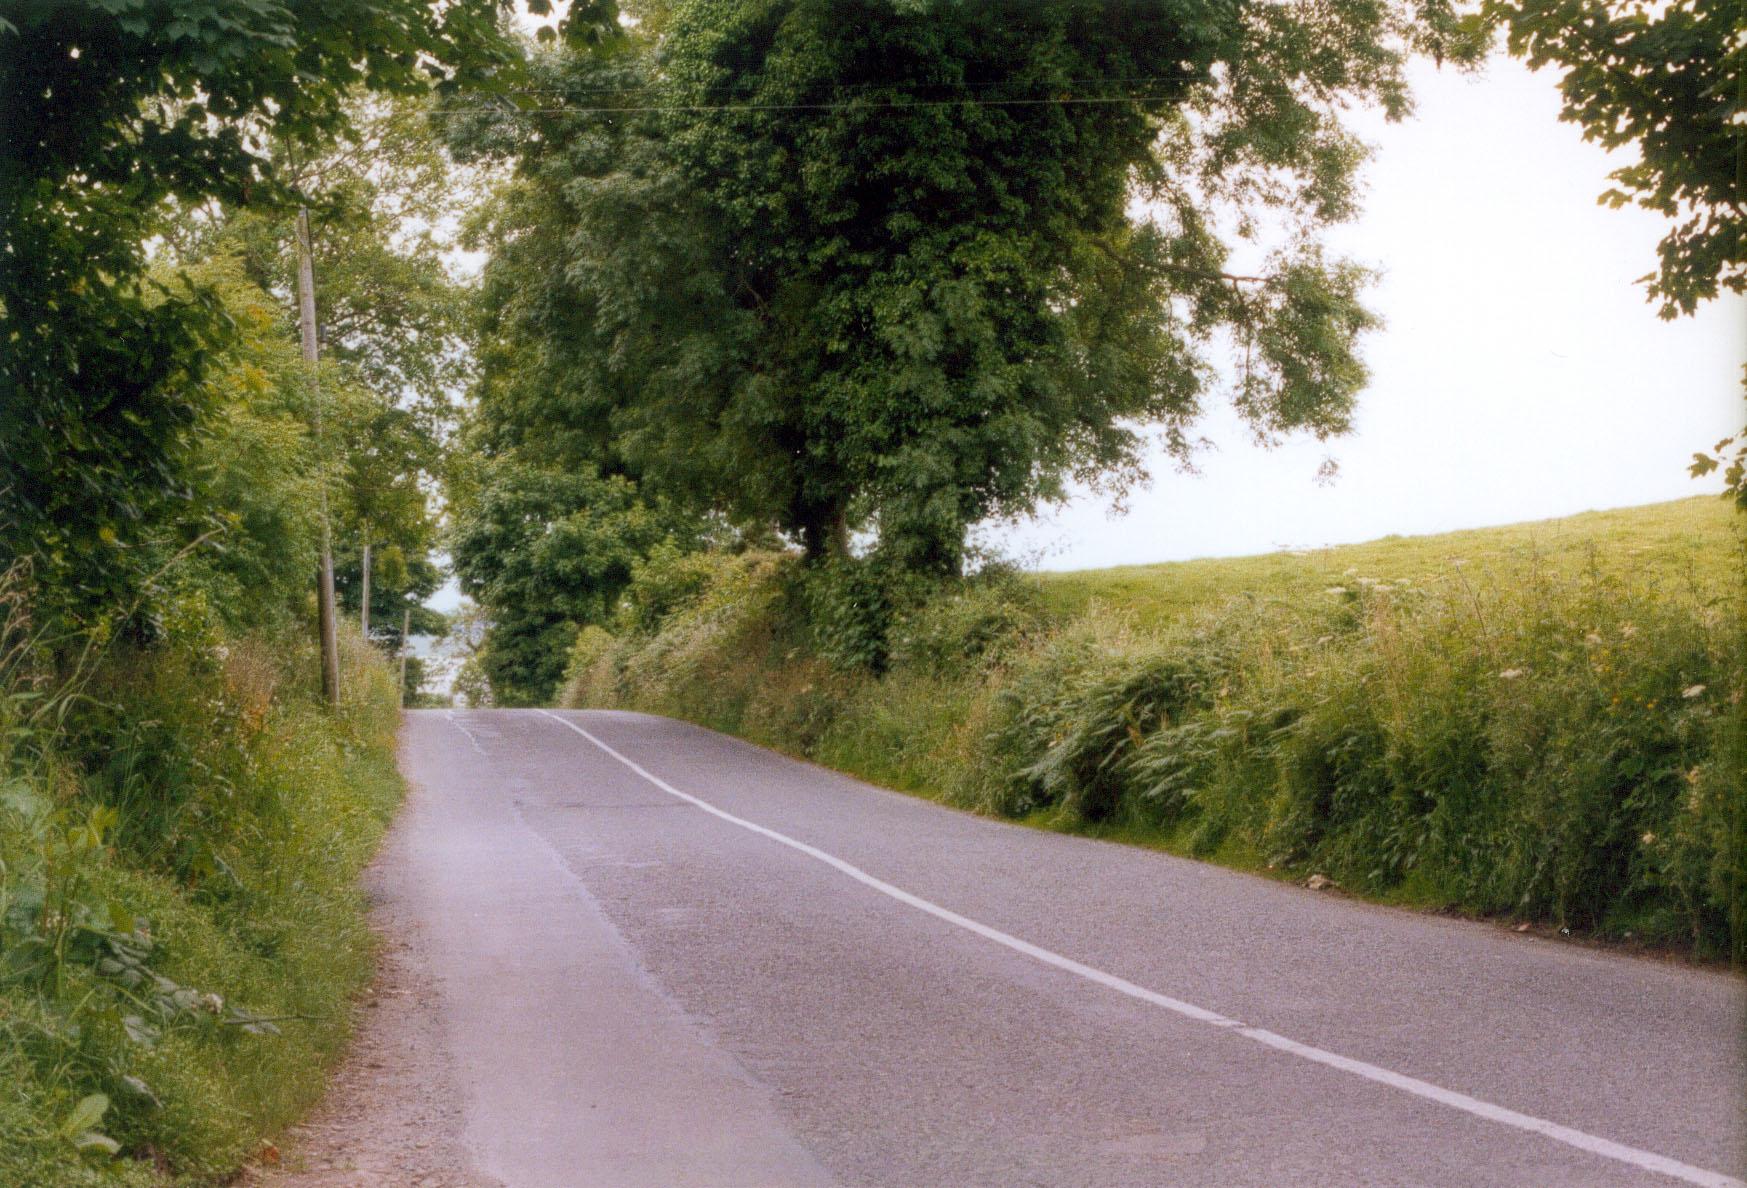 Gravity Hill near Carlingford, Cooley Peninsula, County Louth, Ireland.